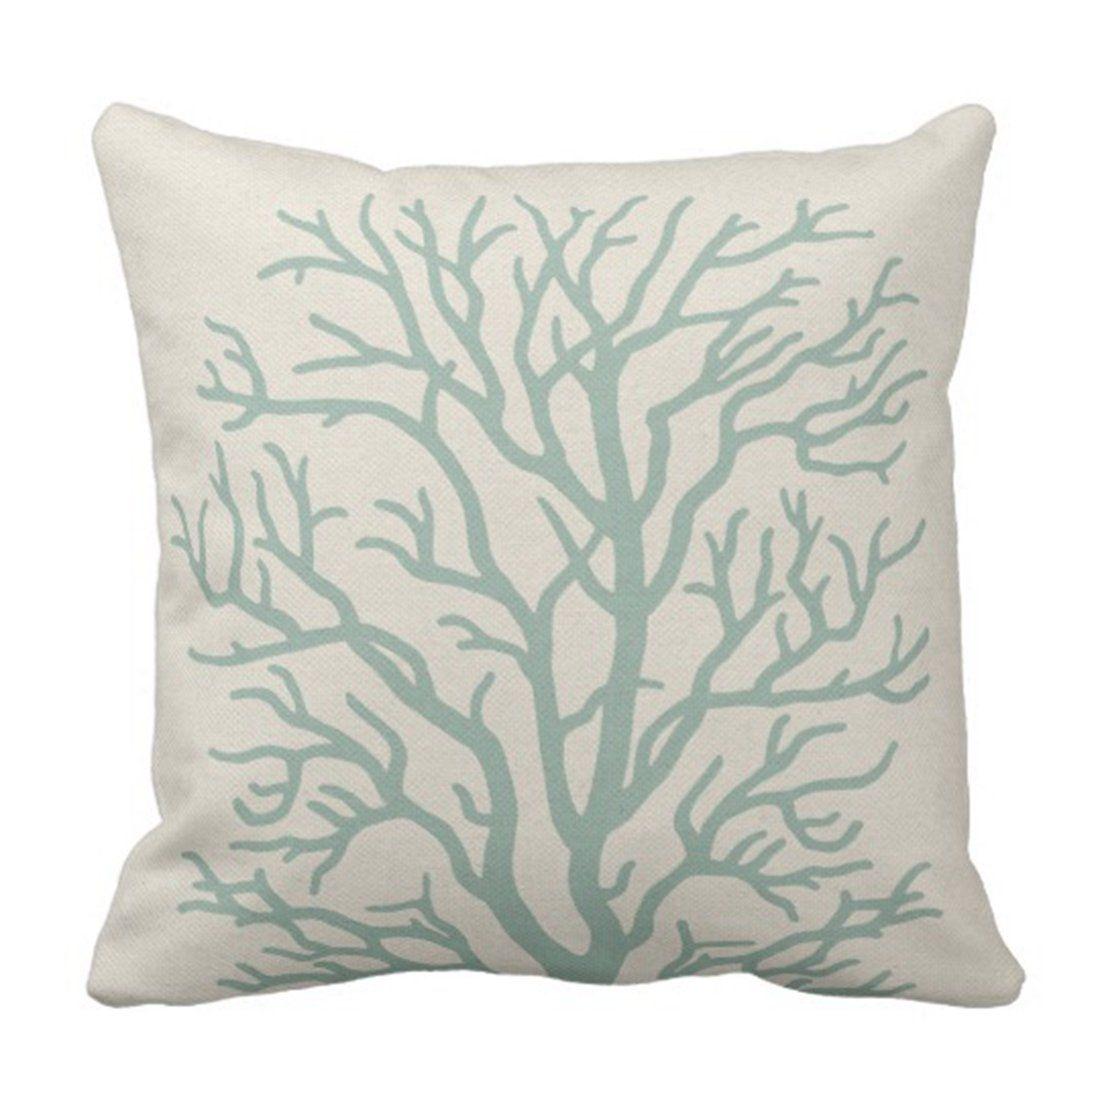 Tan Reef Coral Tree In Seafoam Branches Pillowcase Cushion Cover